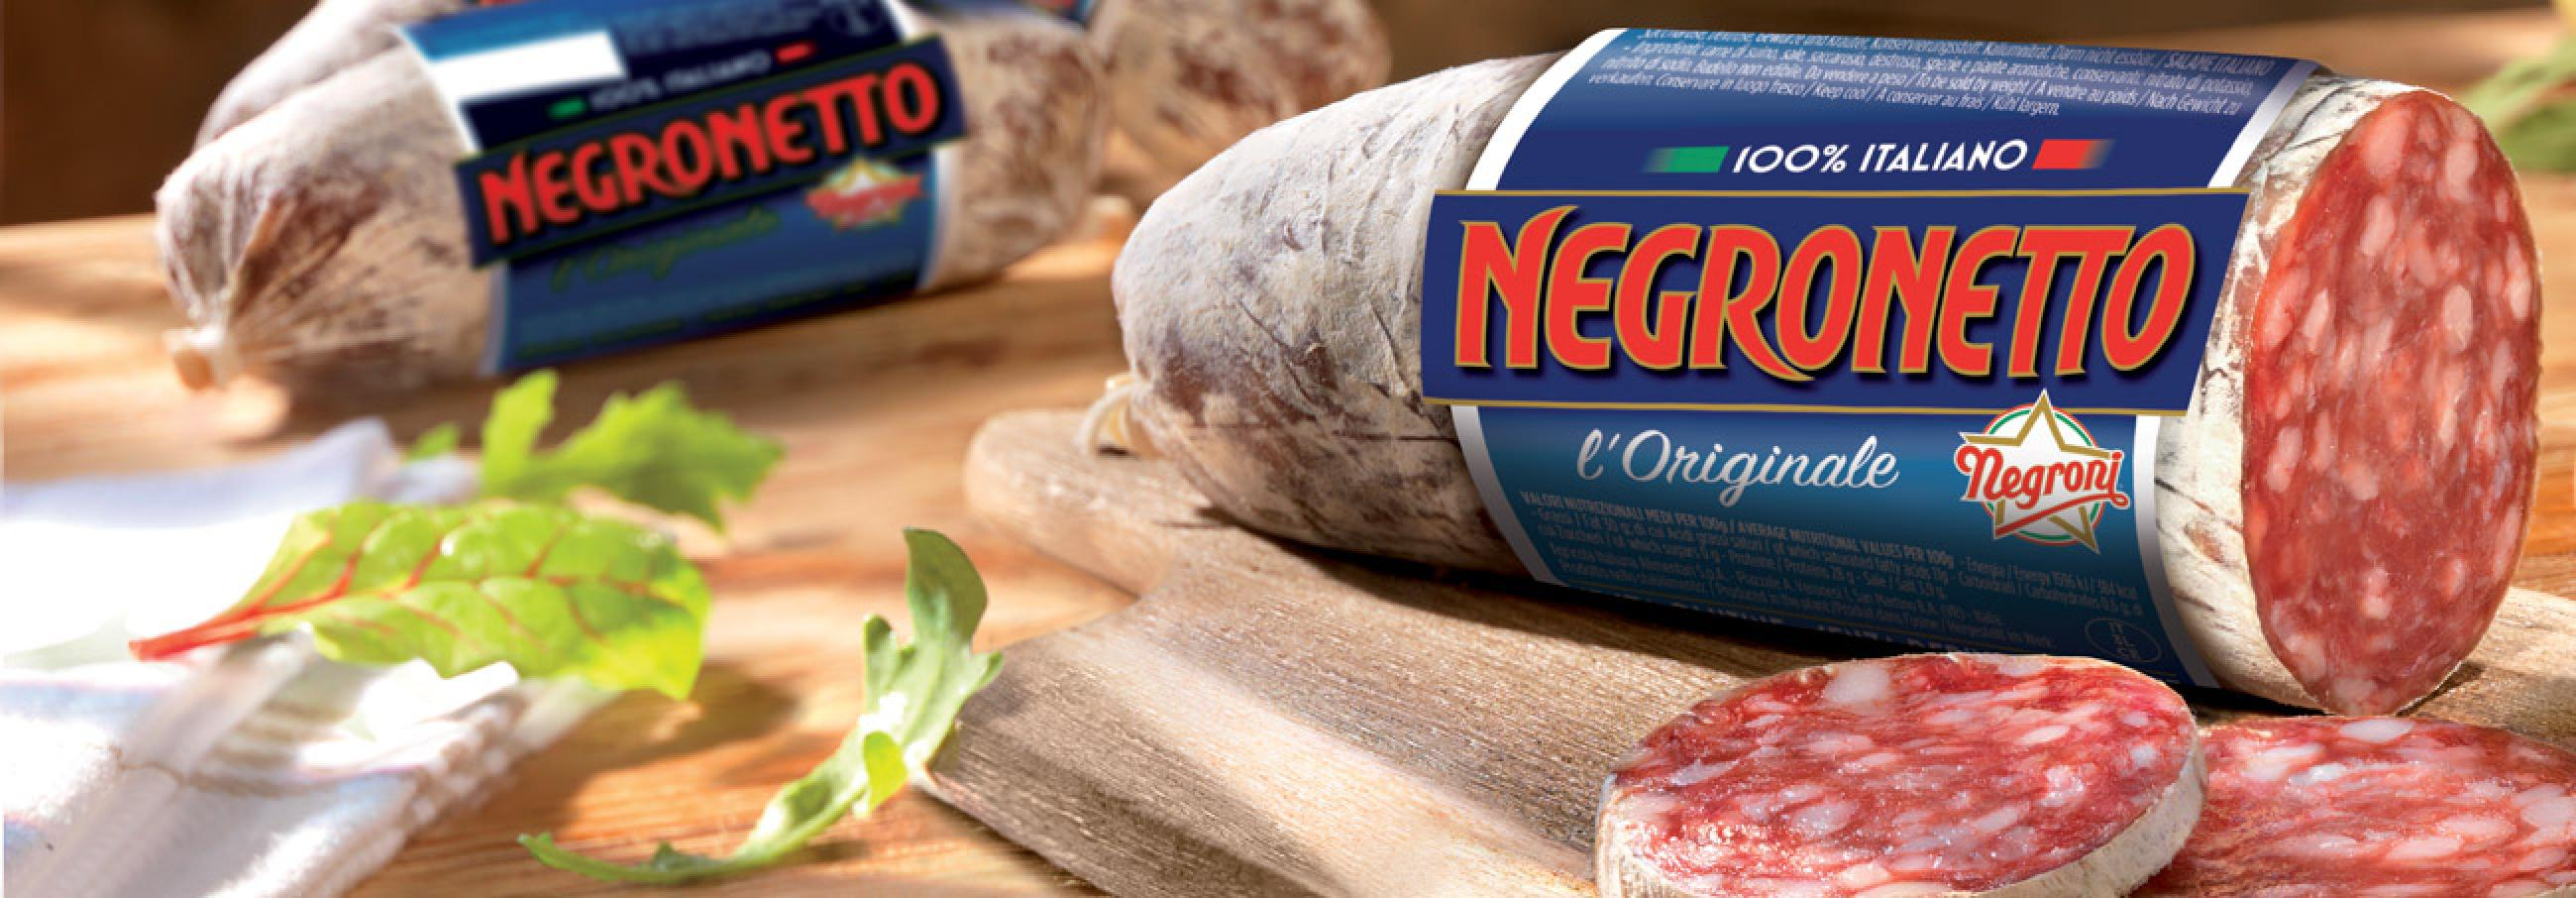 Negronetto